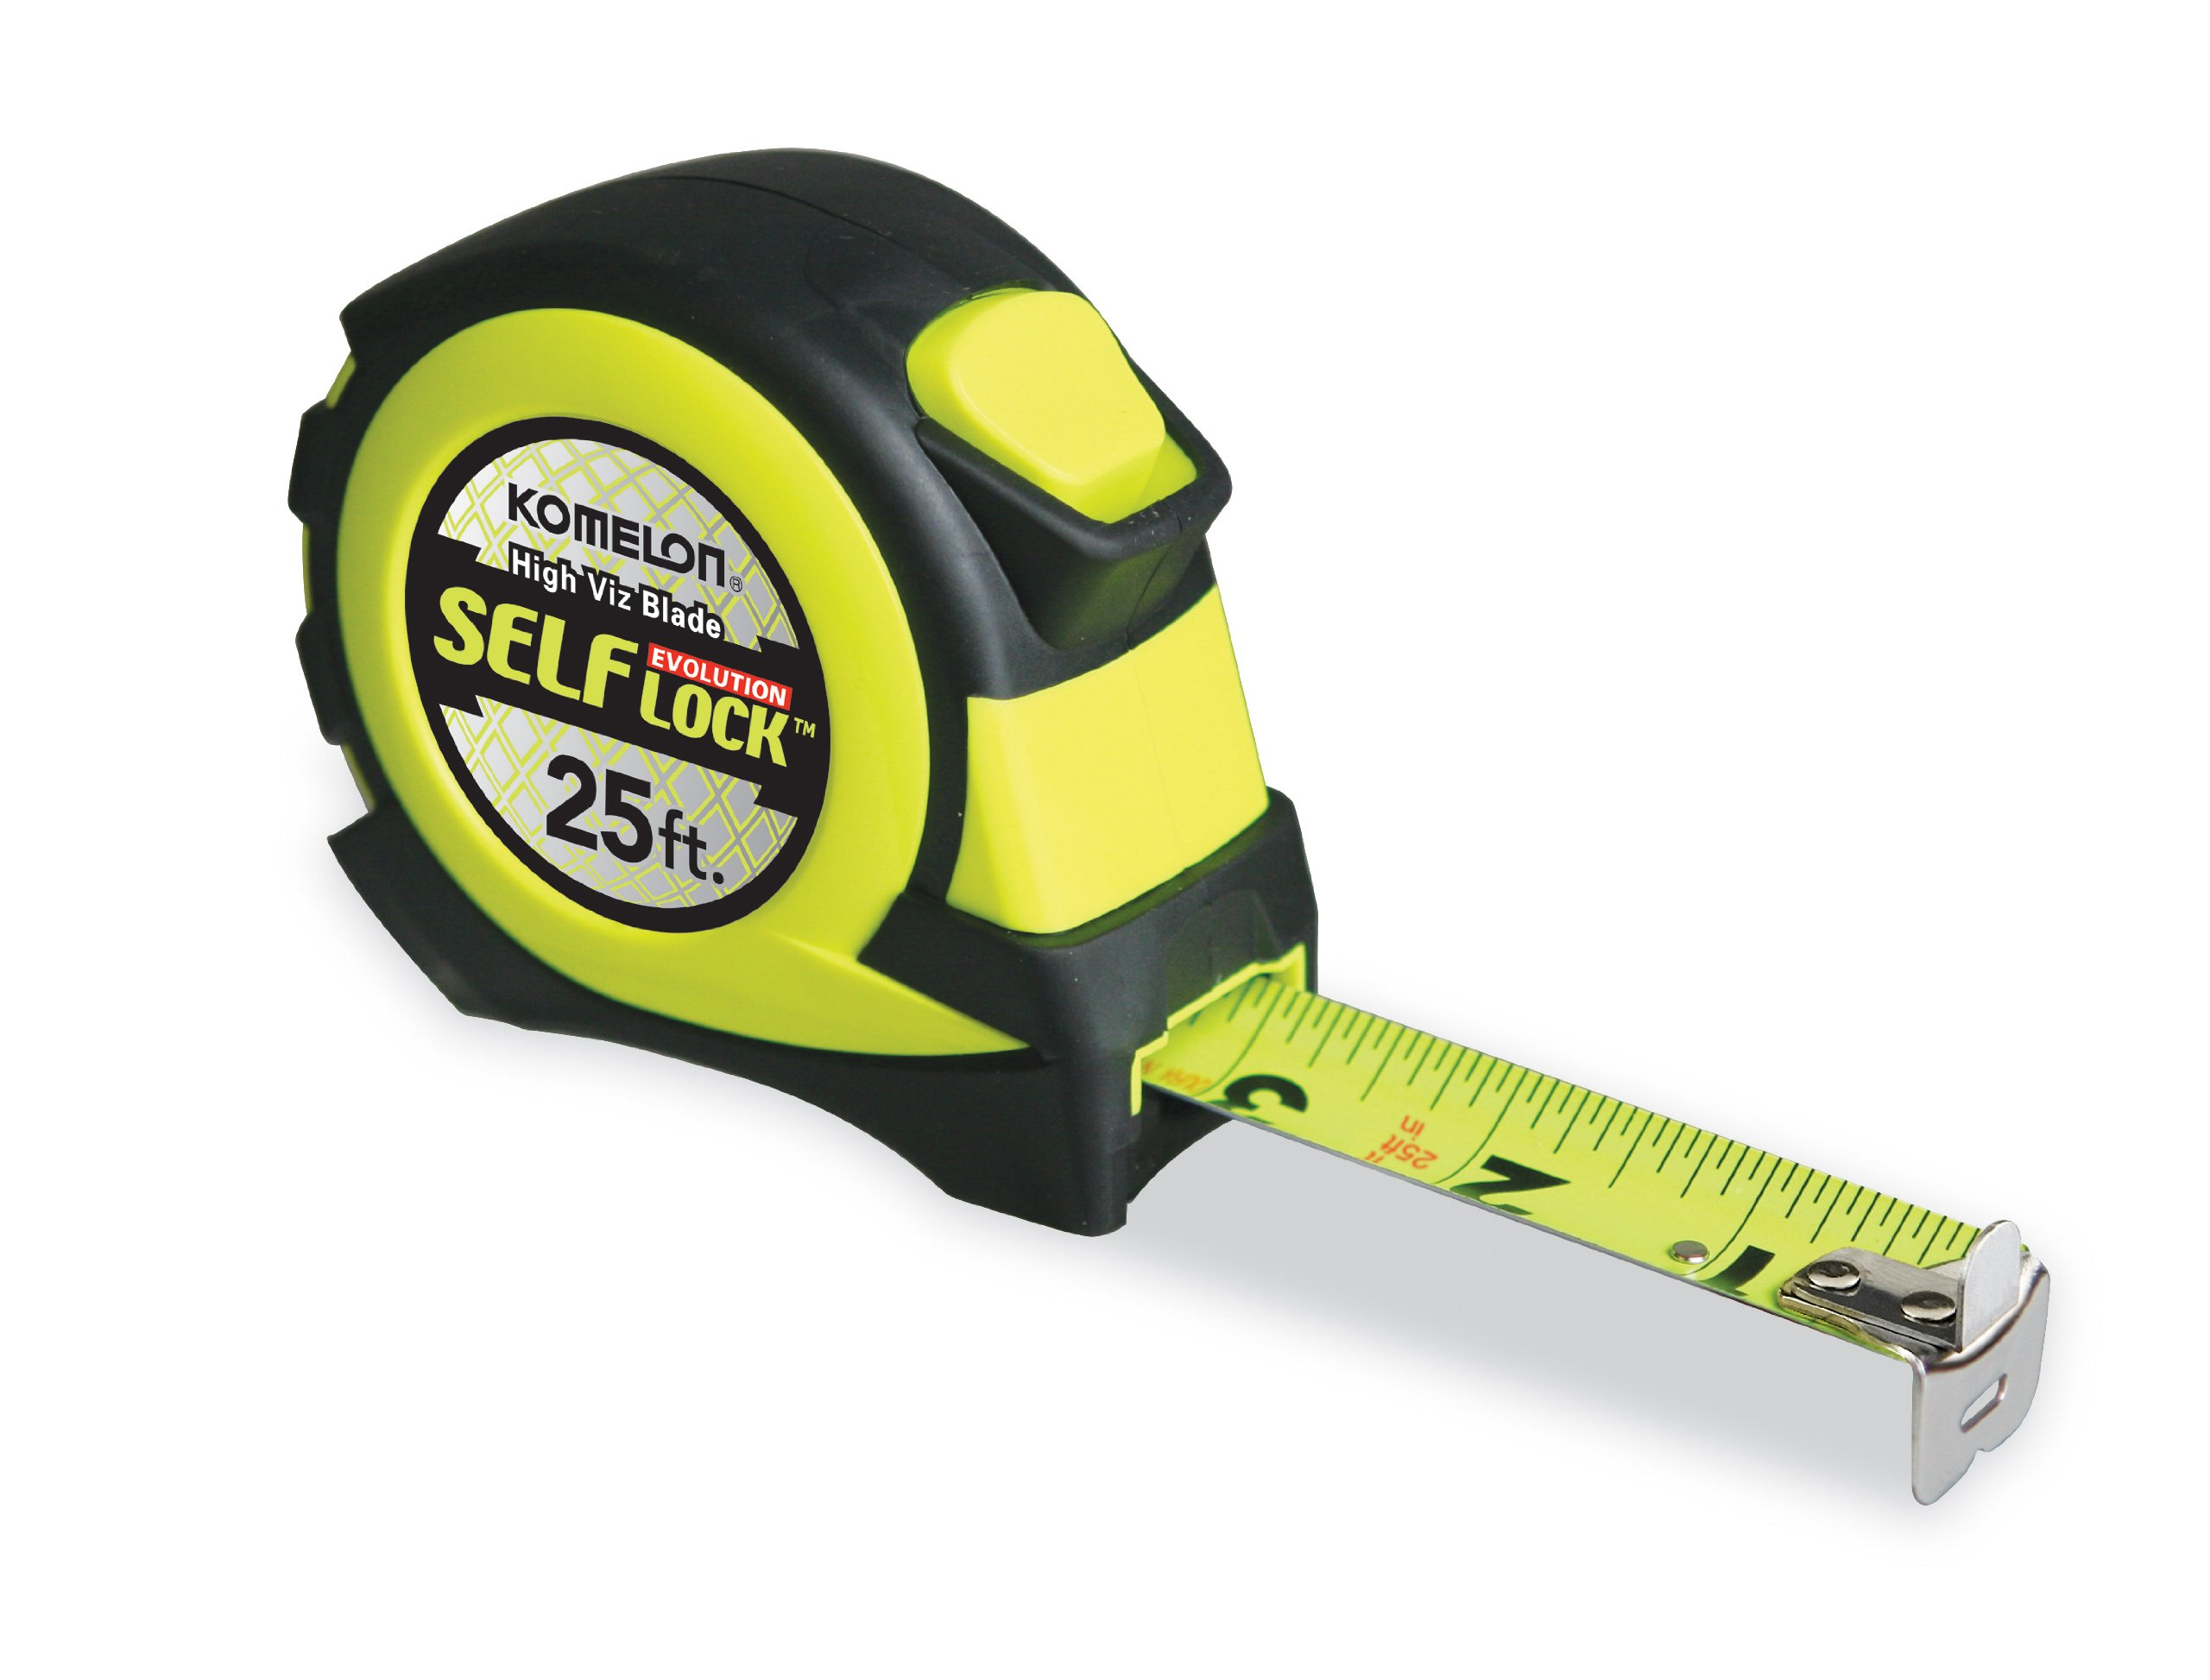 Komelon EV2825 25' x 1'' Self-Lock Evolution Tape Measure, 1-Pack by Komelon